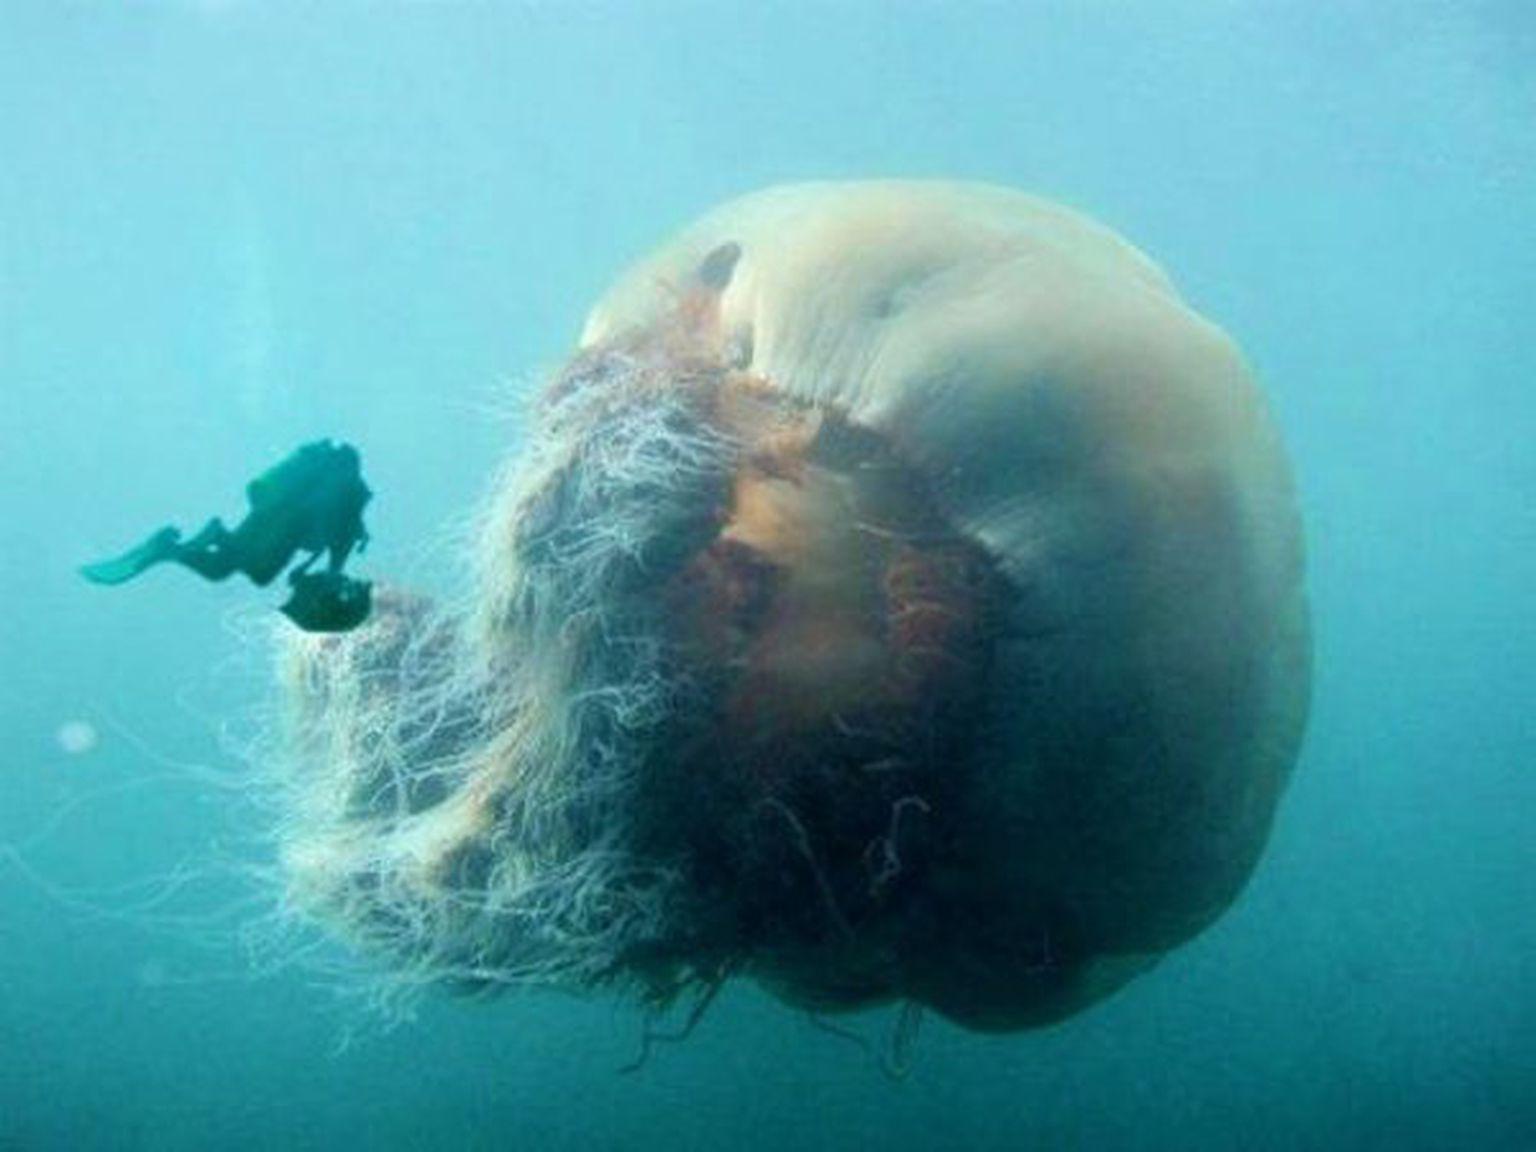 Honking Big Jellyfish